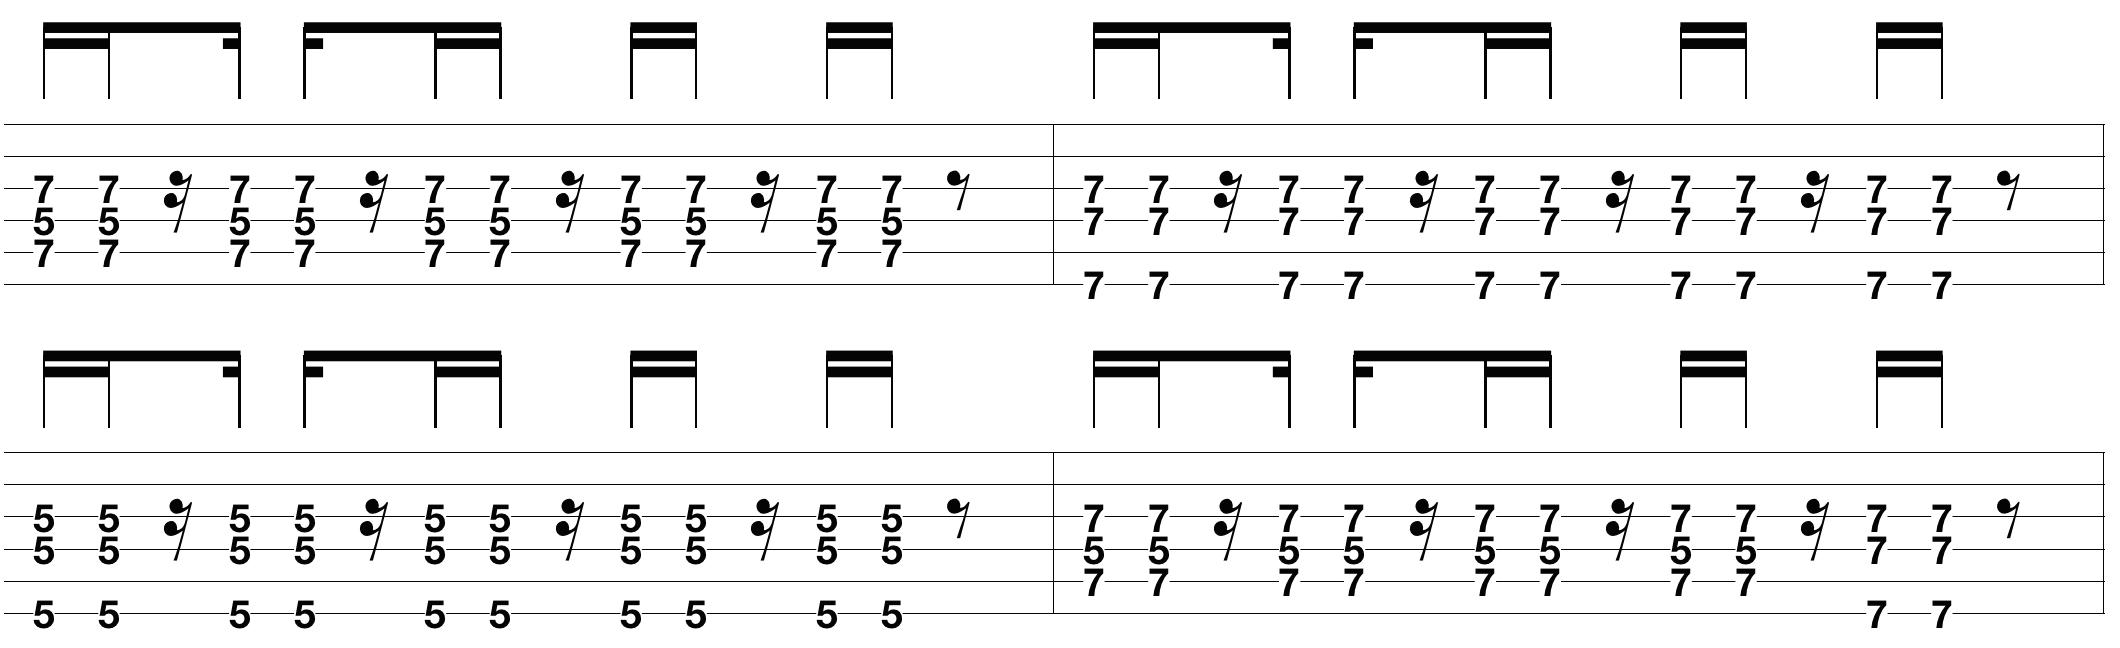 learning-rhythm-guitar_2.png